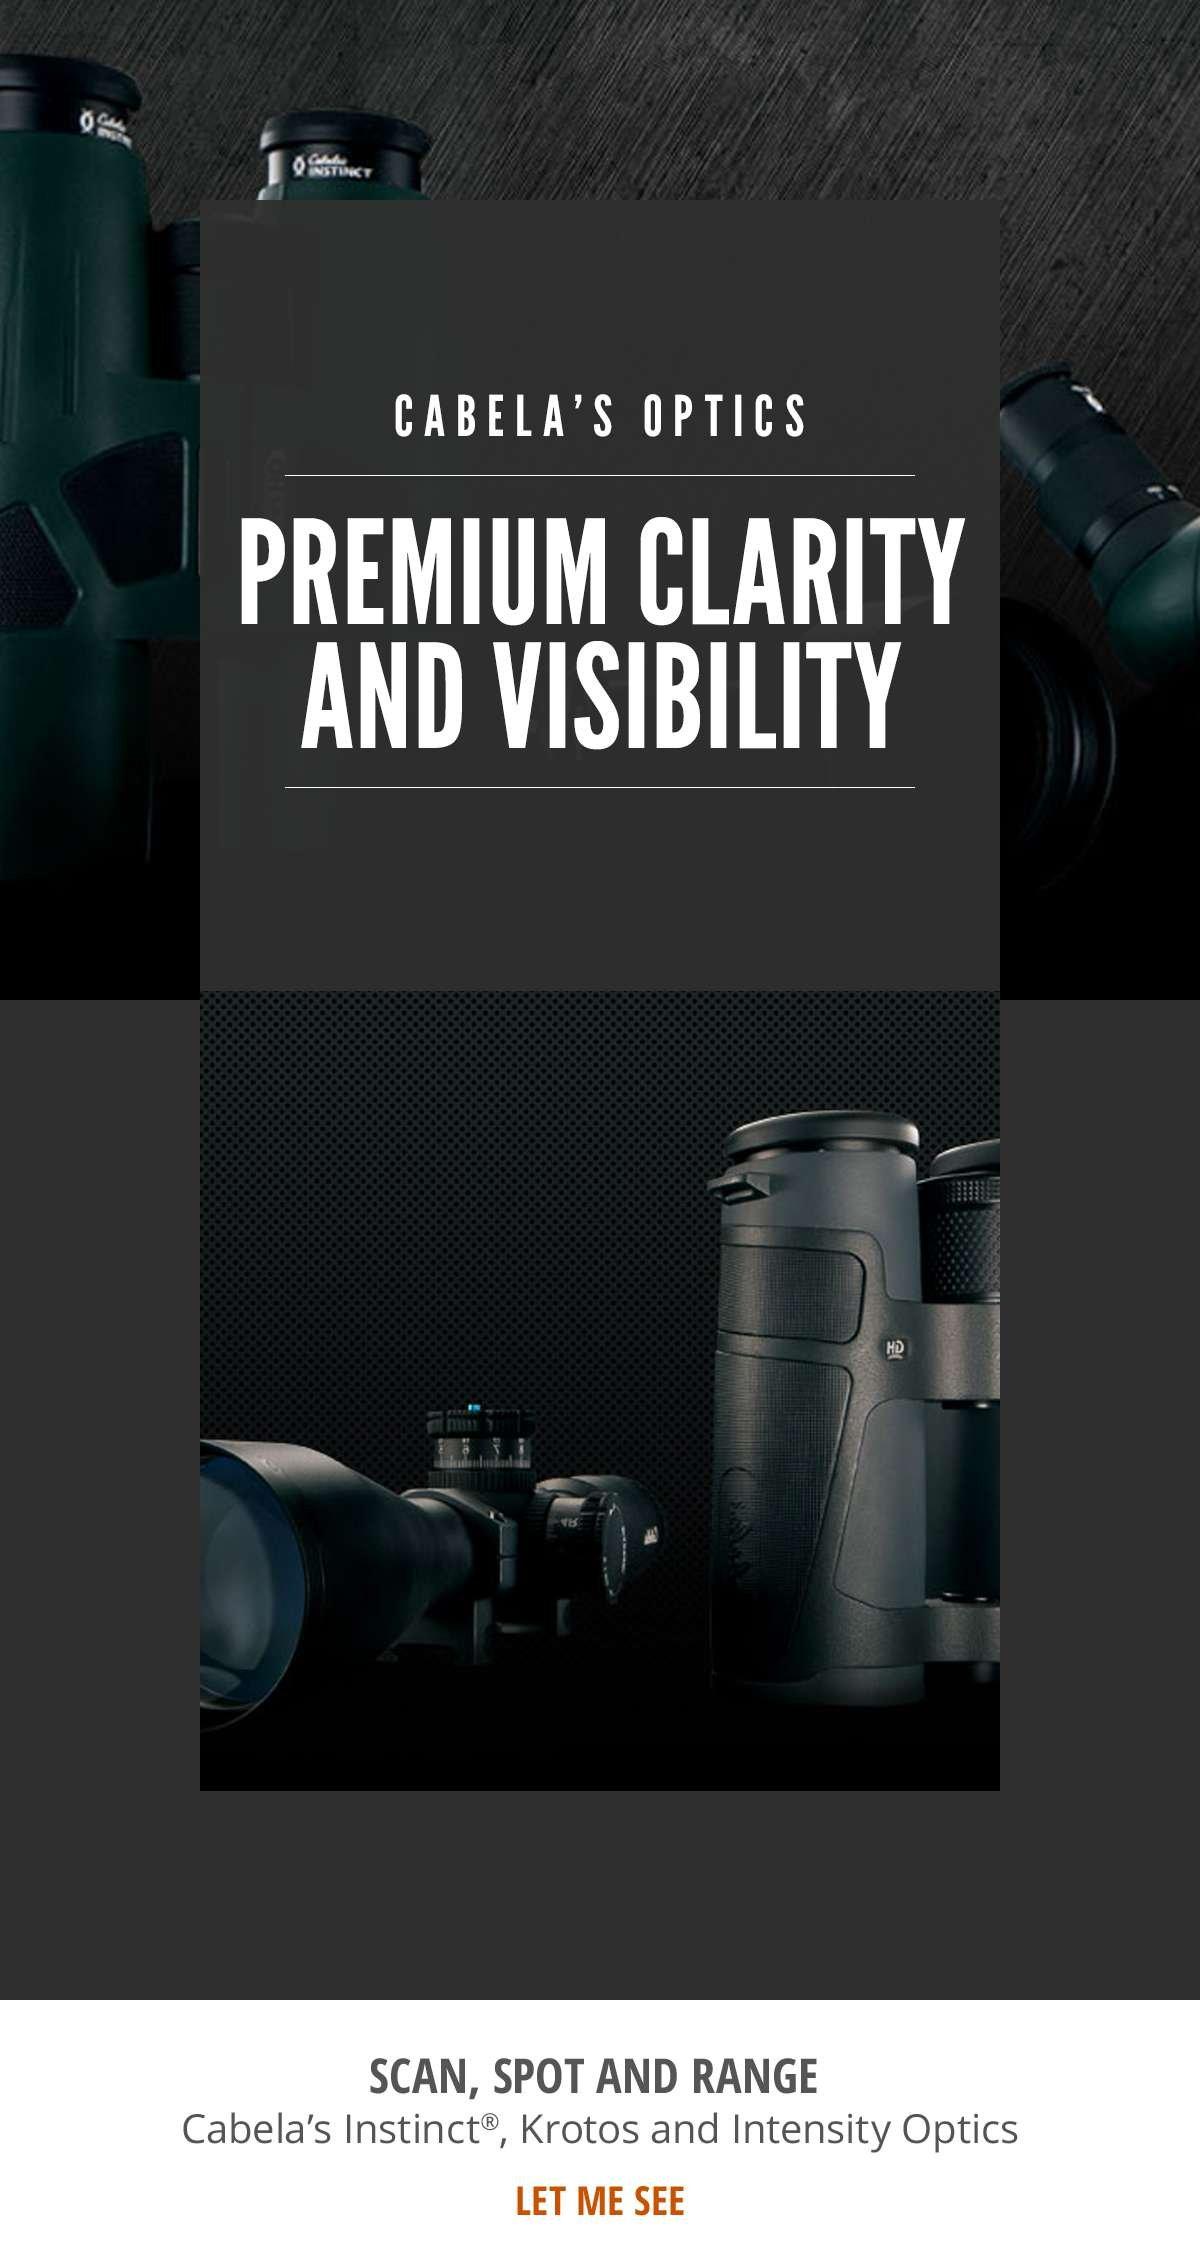 Cabela's Optics - Premium Clarity and Visibility - Shop Now